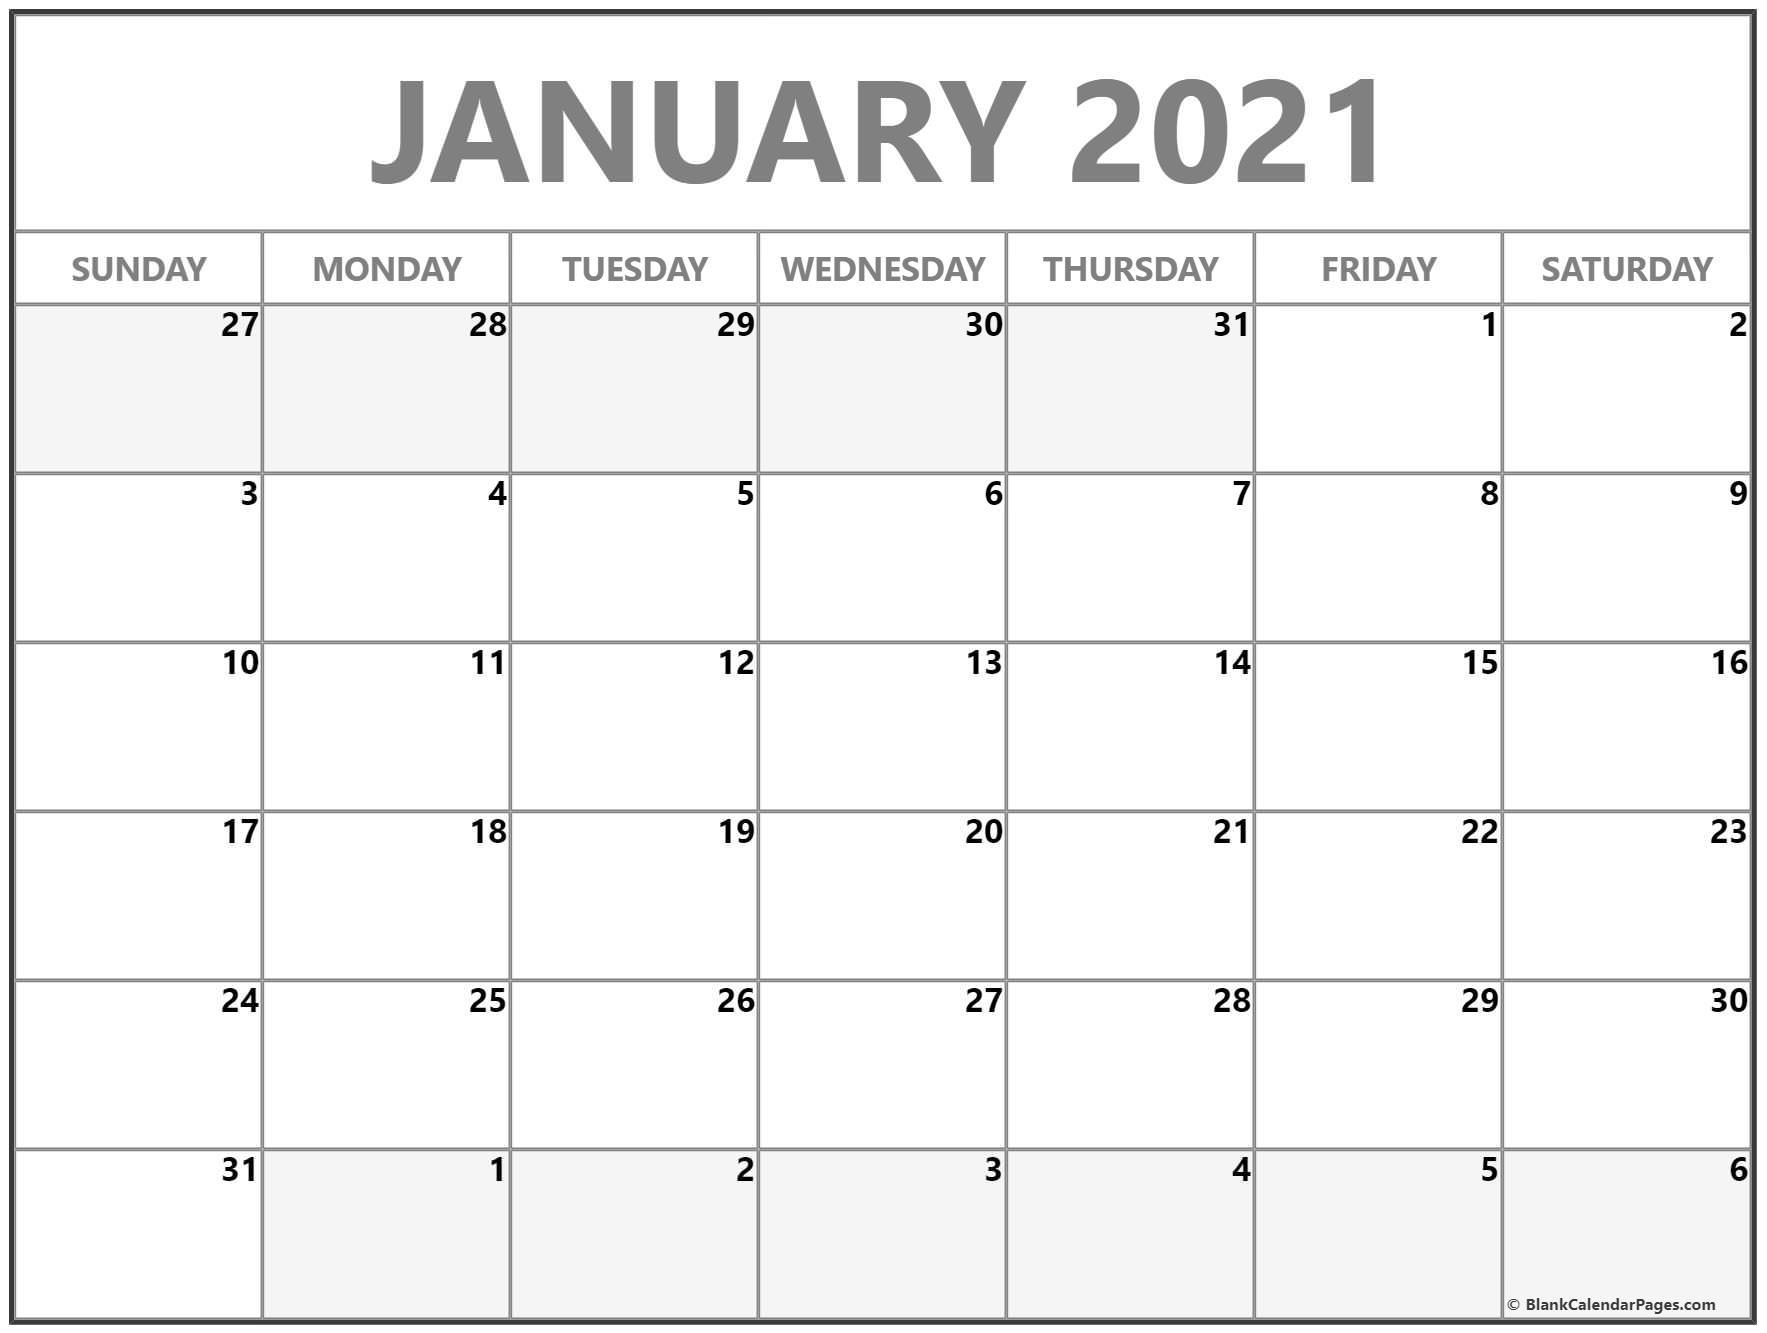 January 2021 Blank Calendar Collection 3